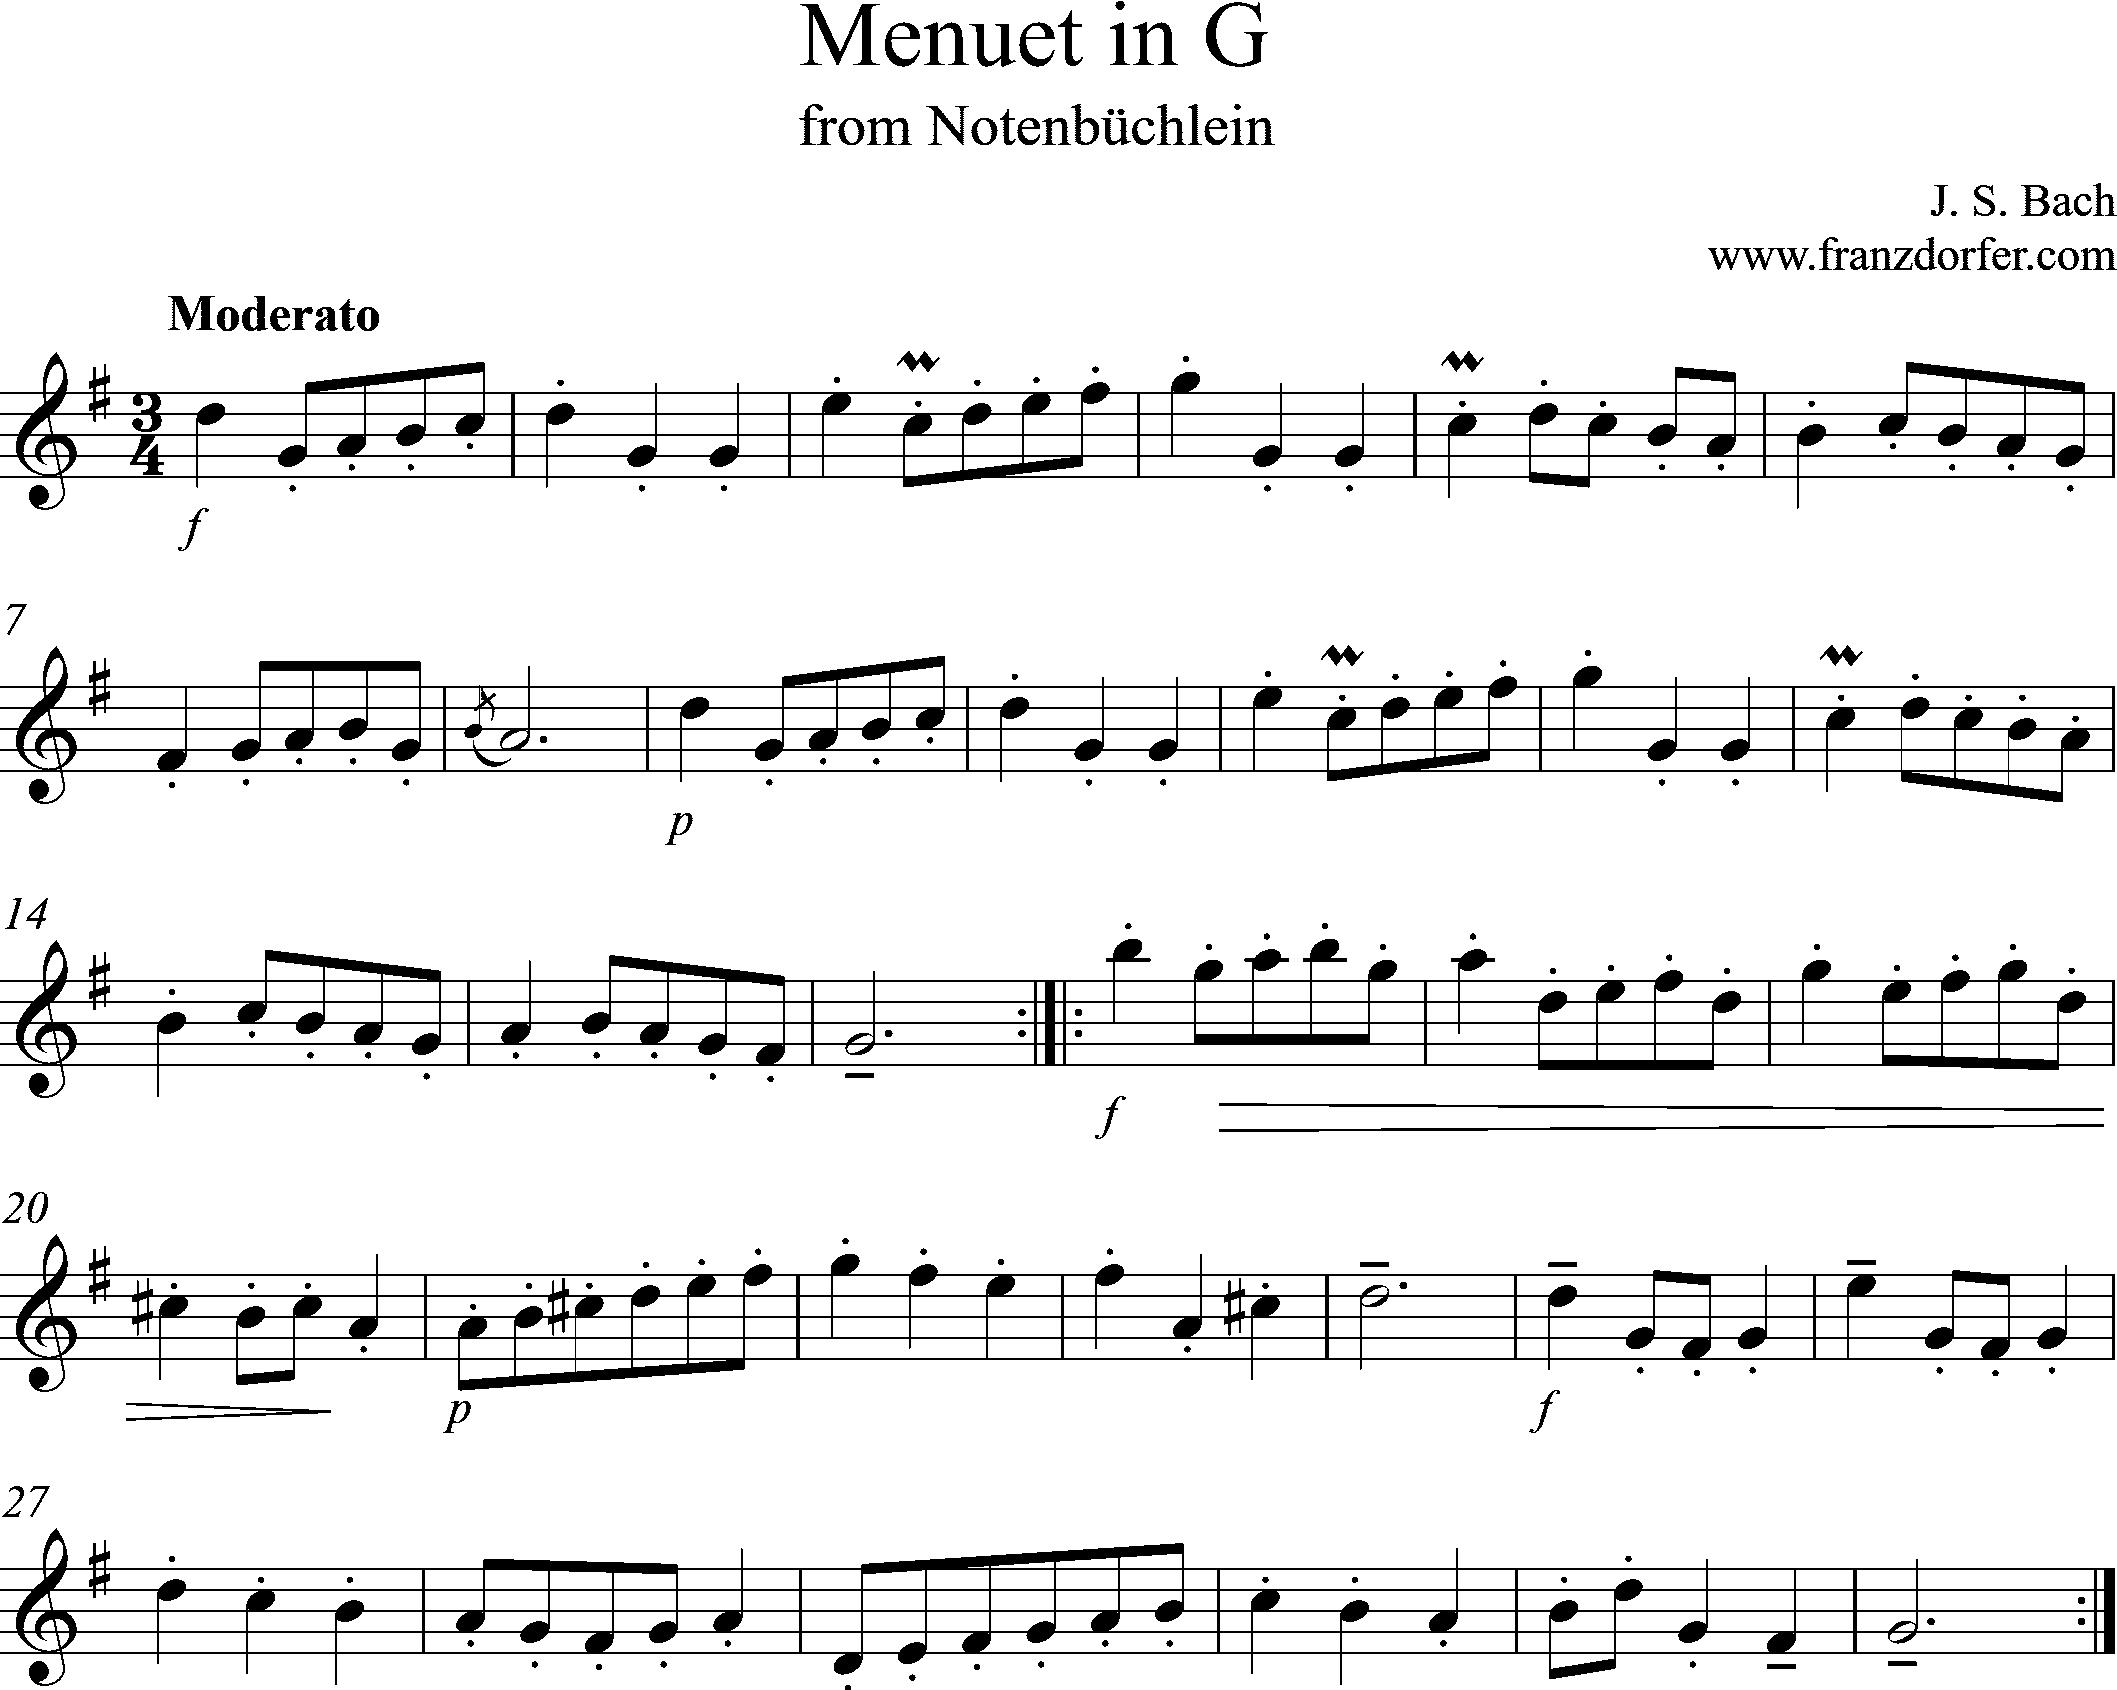 Clarinet Part, Menuet in G, Bach